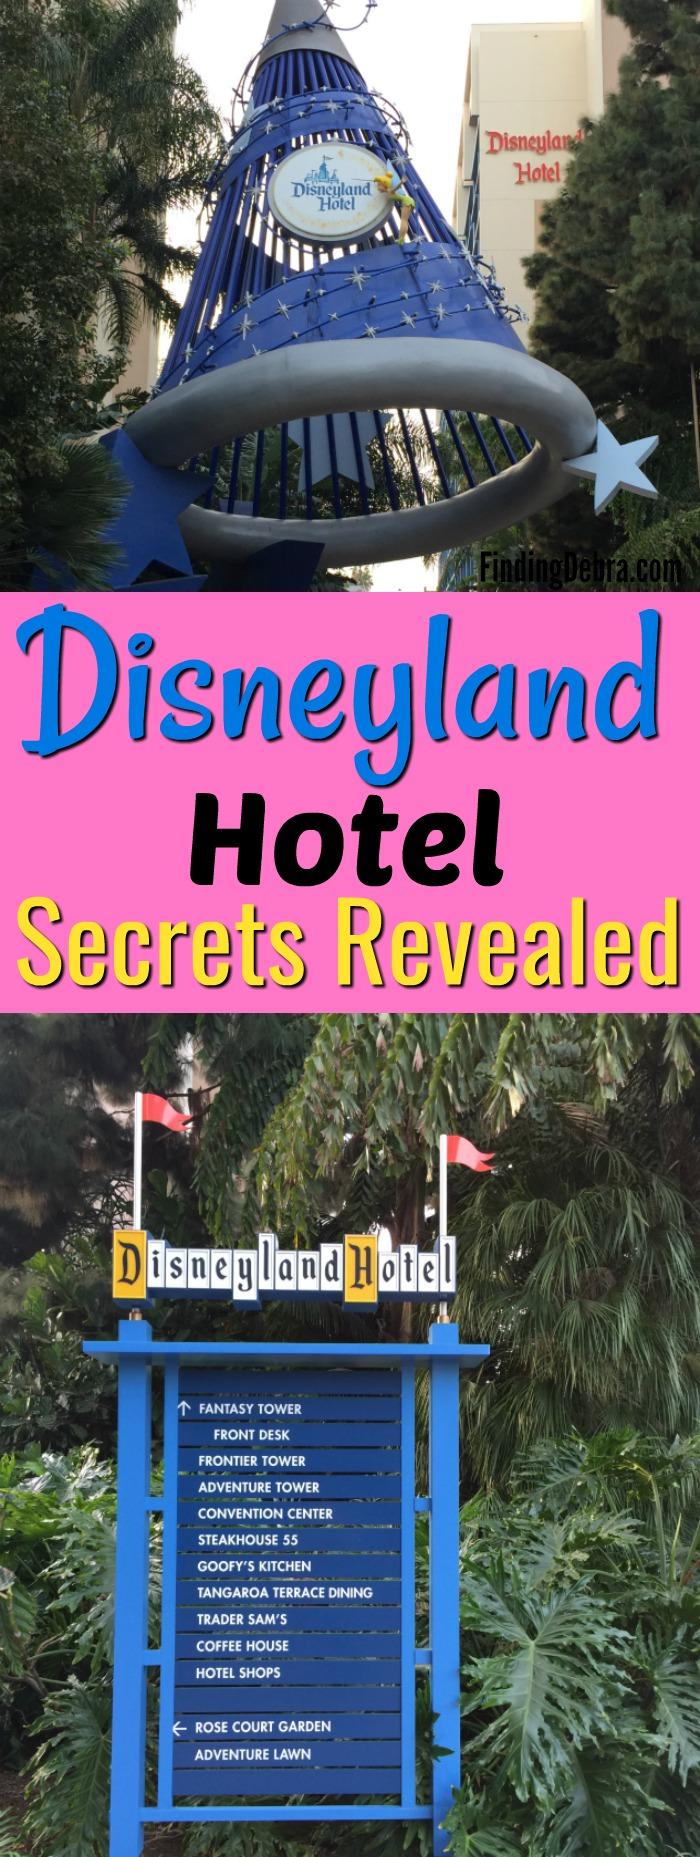 Disneyland Hotel Secrets Revealed